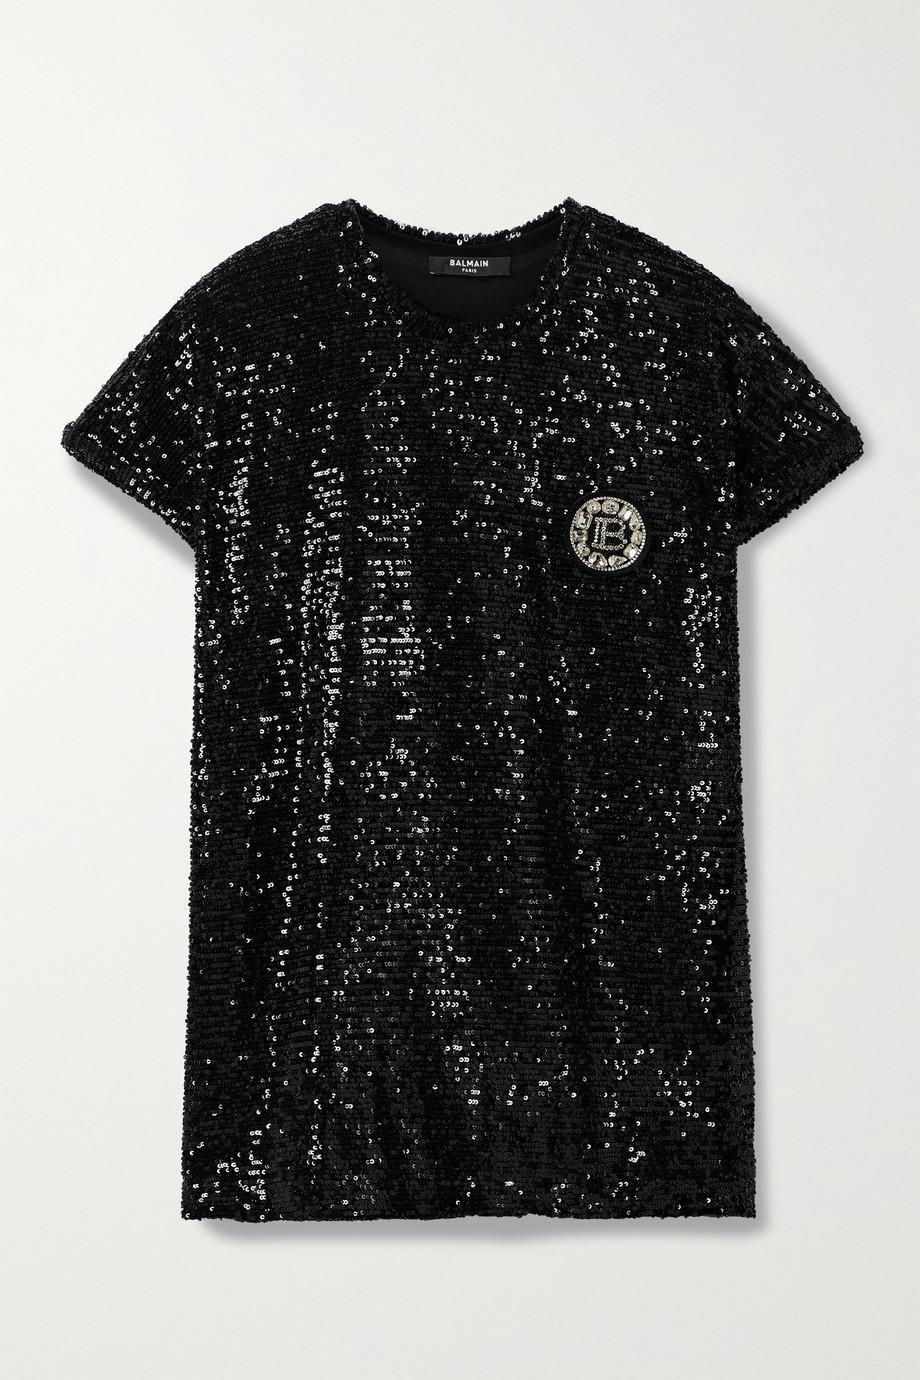 Balmain Embellished sequined jersey T-shirt